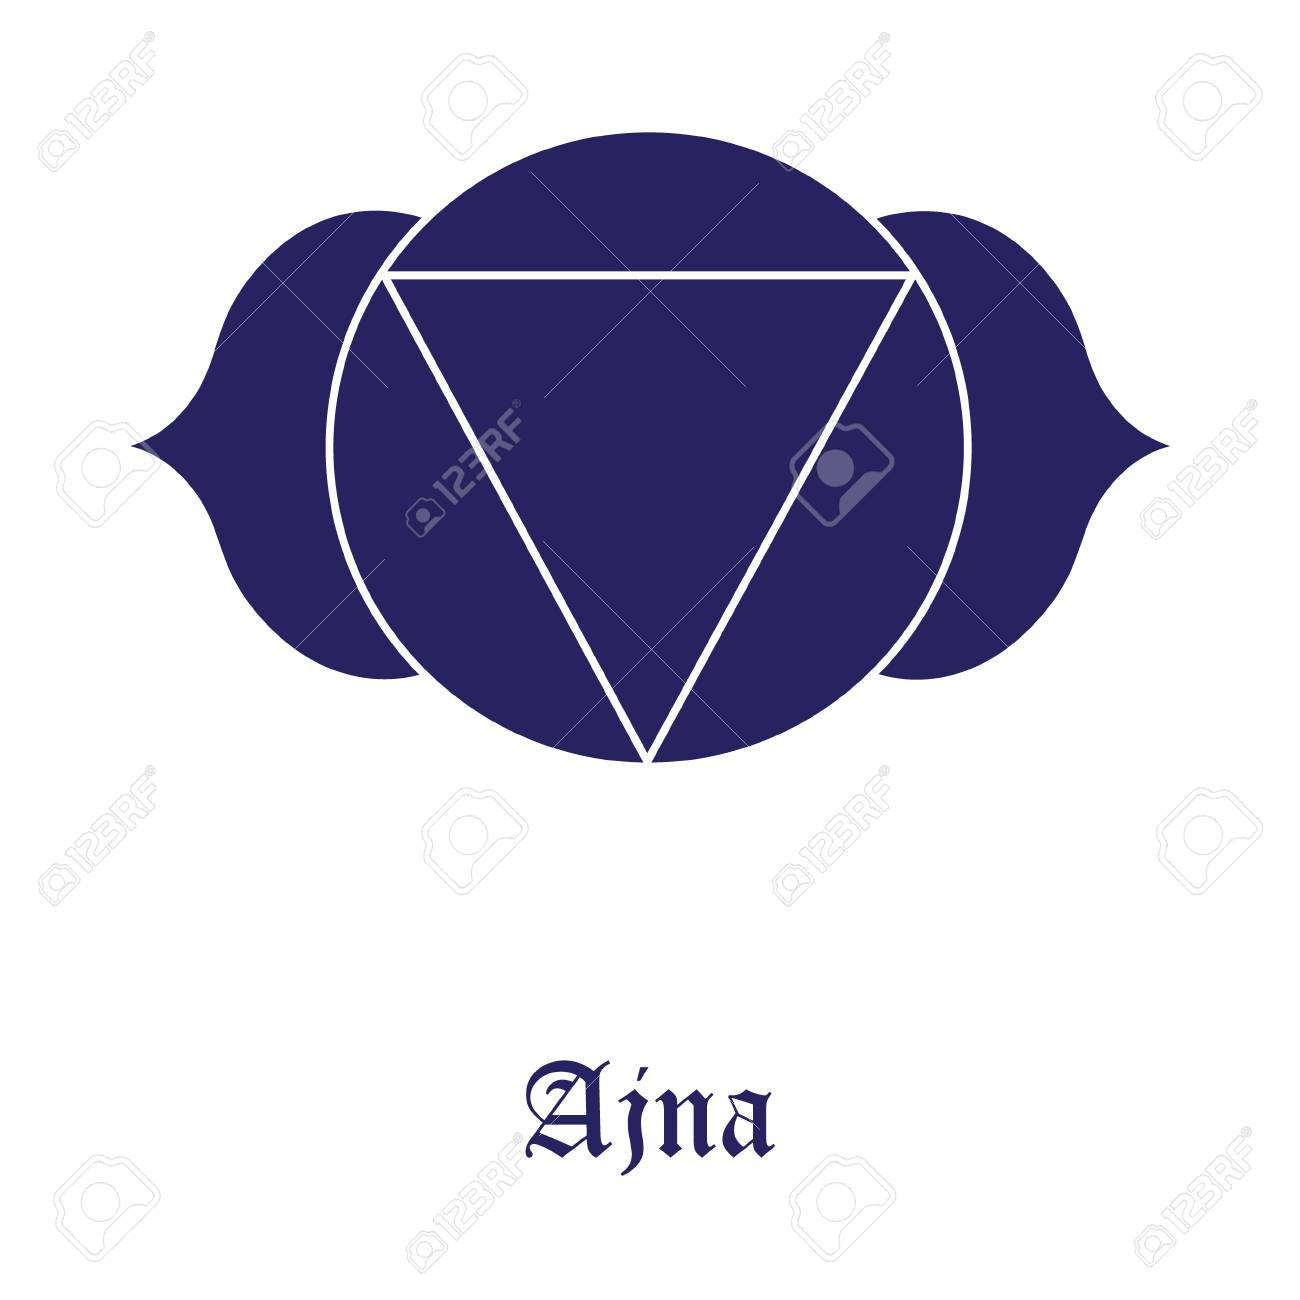 Ajna Chakra Symbol Raster Illustration The Third Eye Chakra Stock